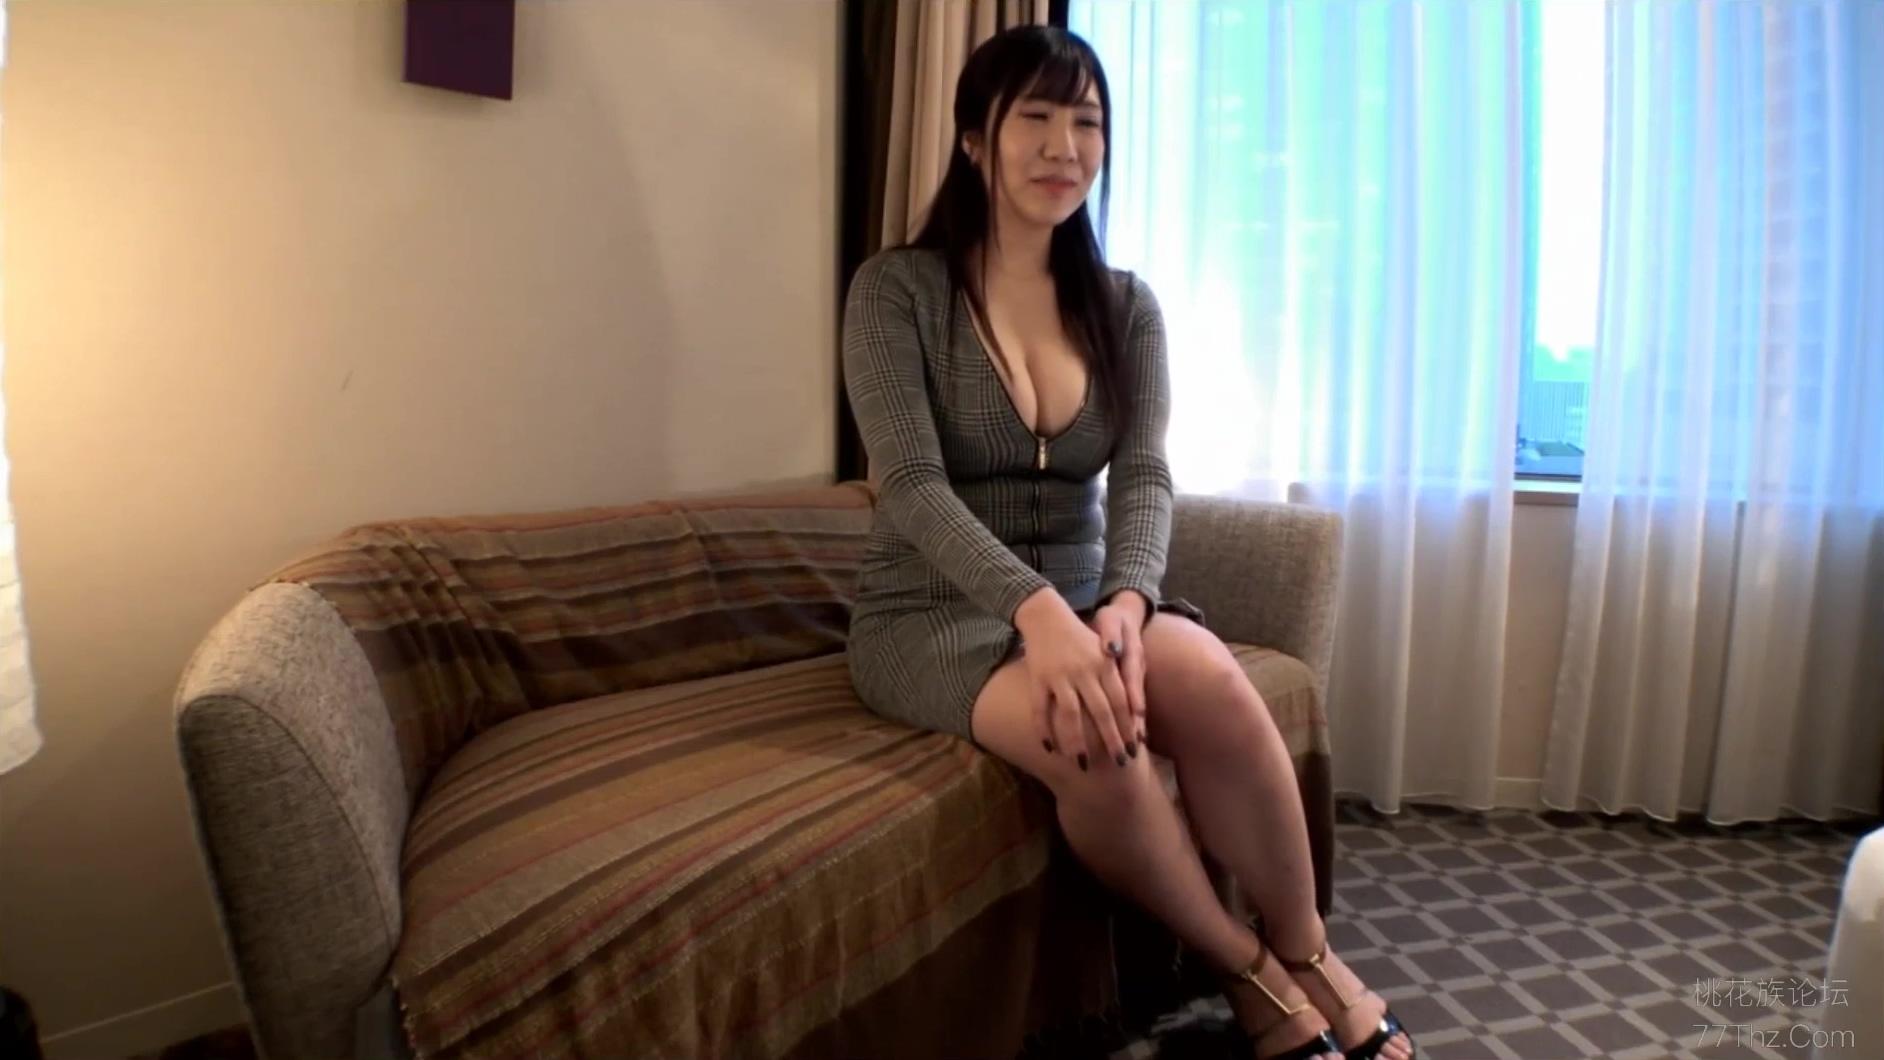 Porn asian mother Mom Tube